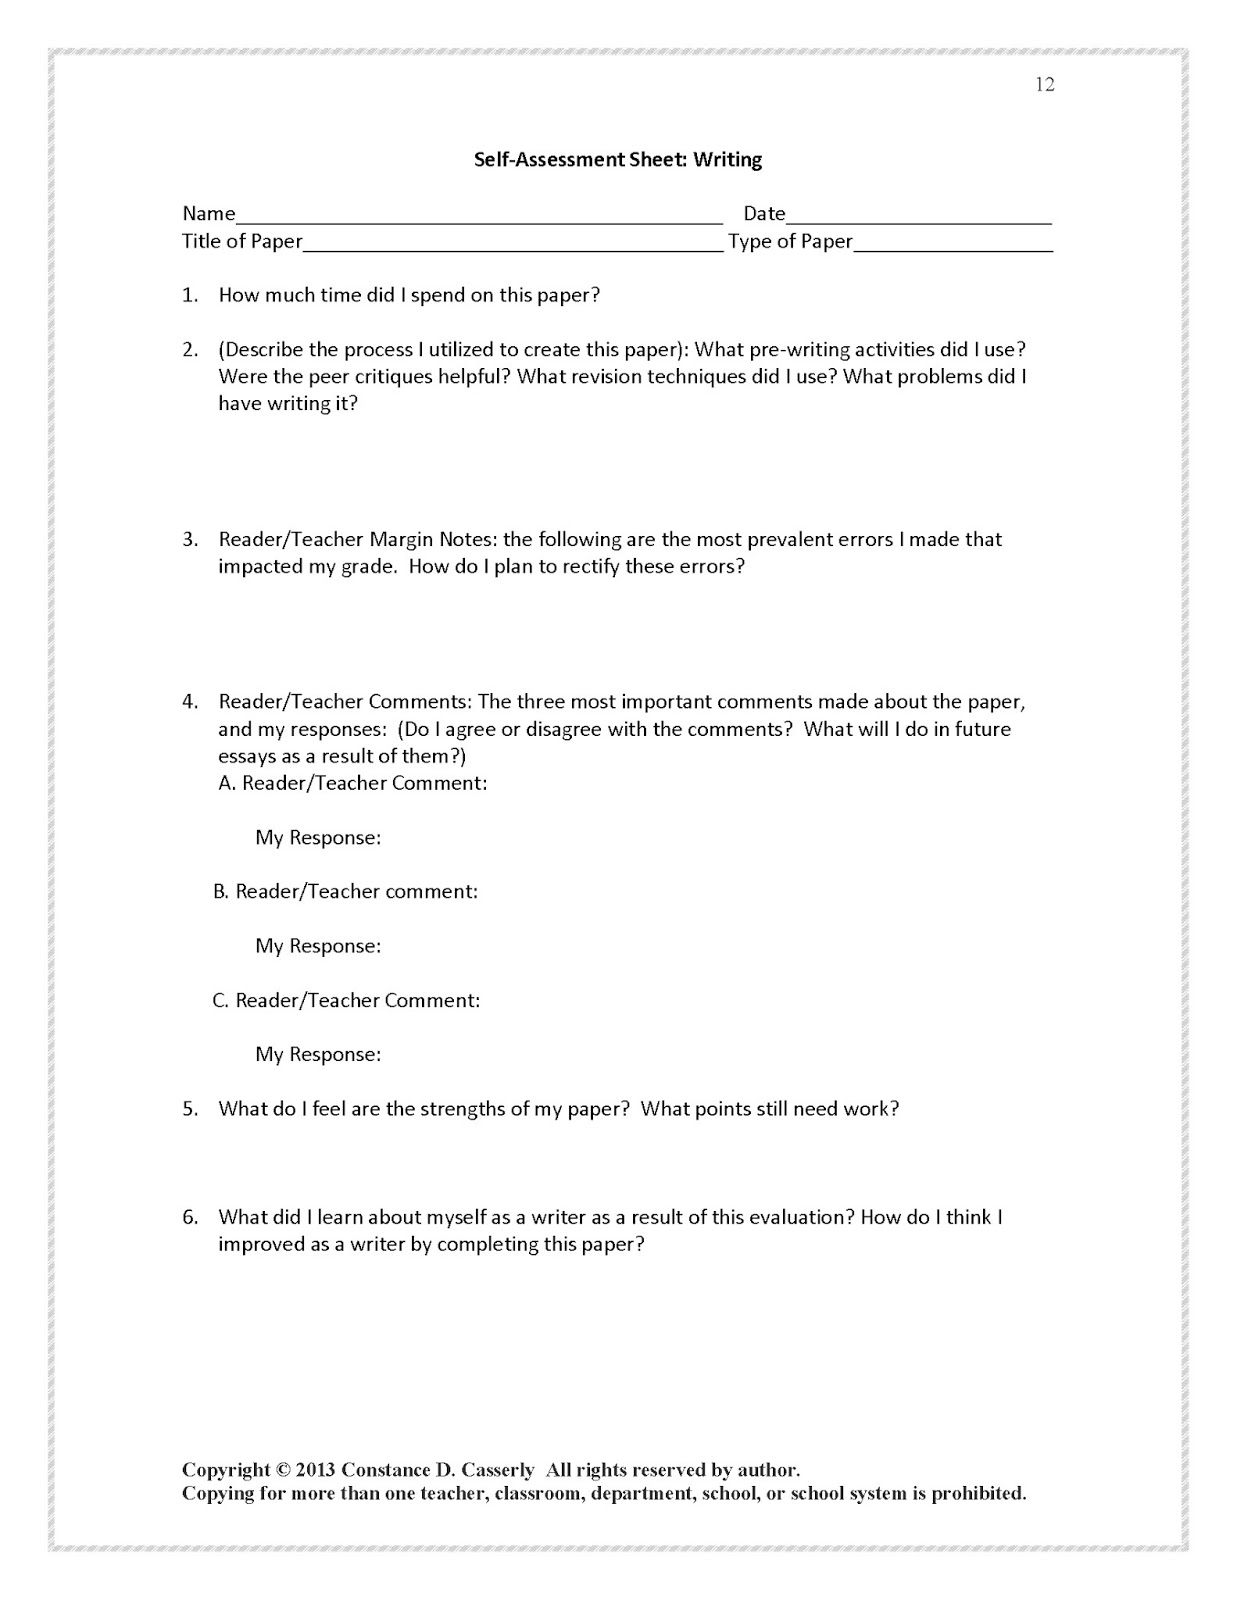 Critical evaluation essay sample